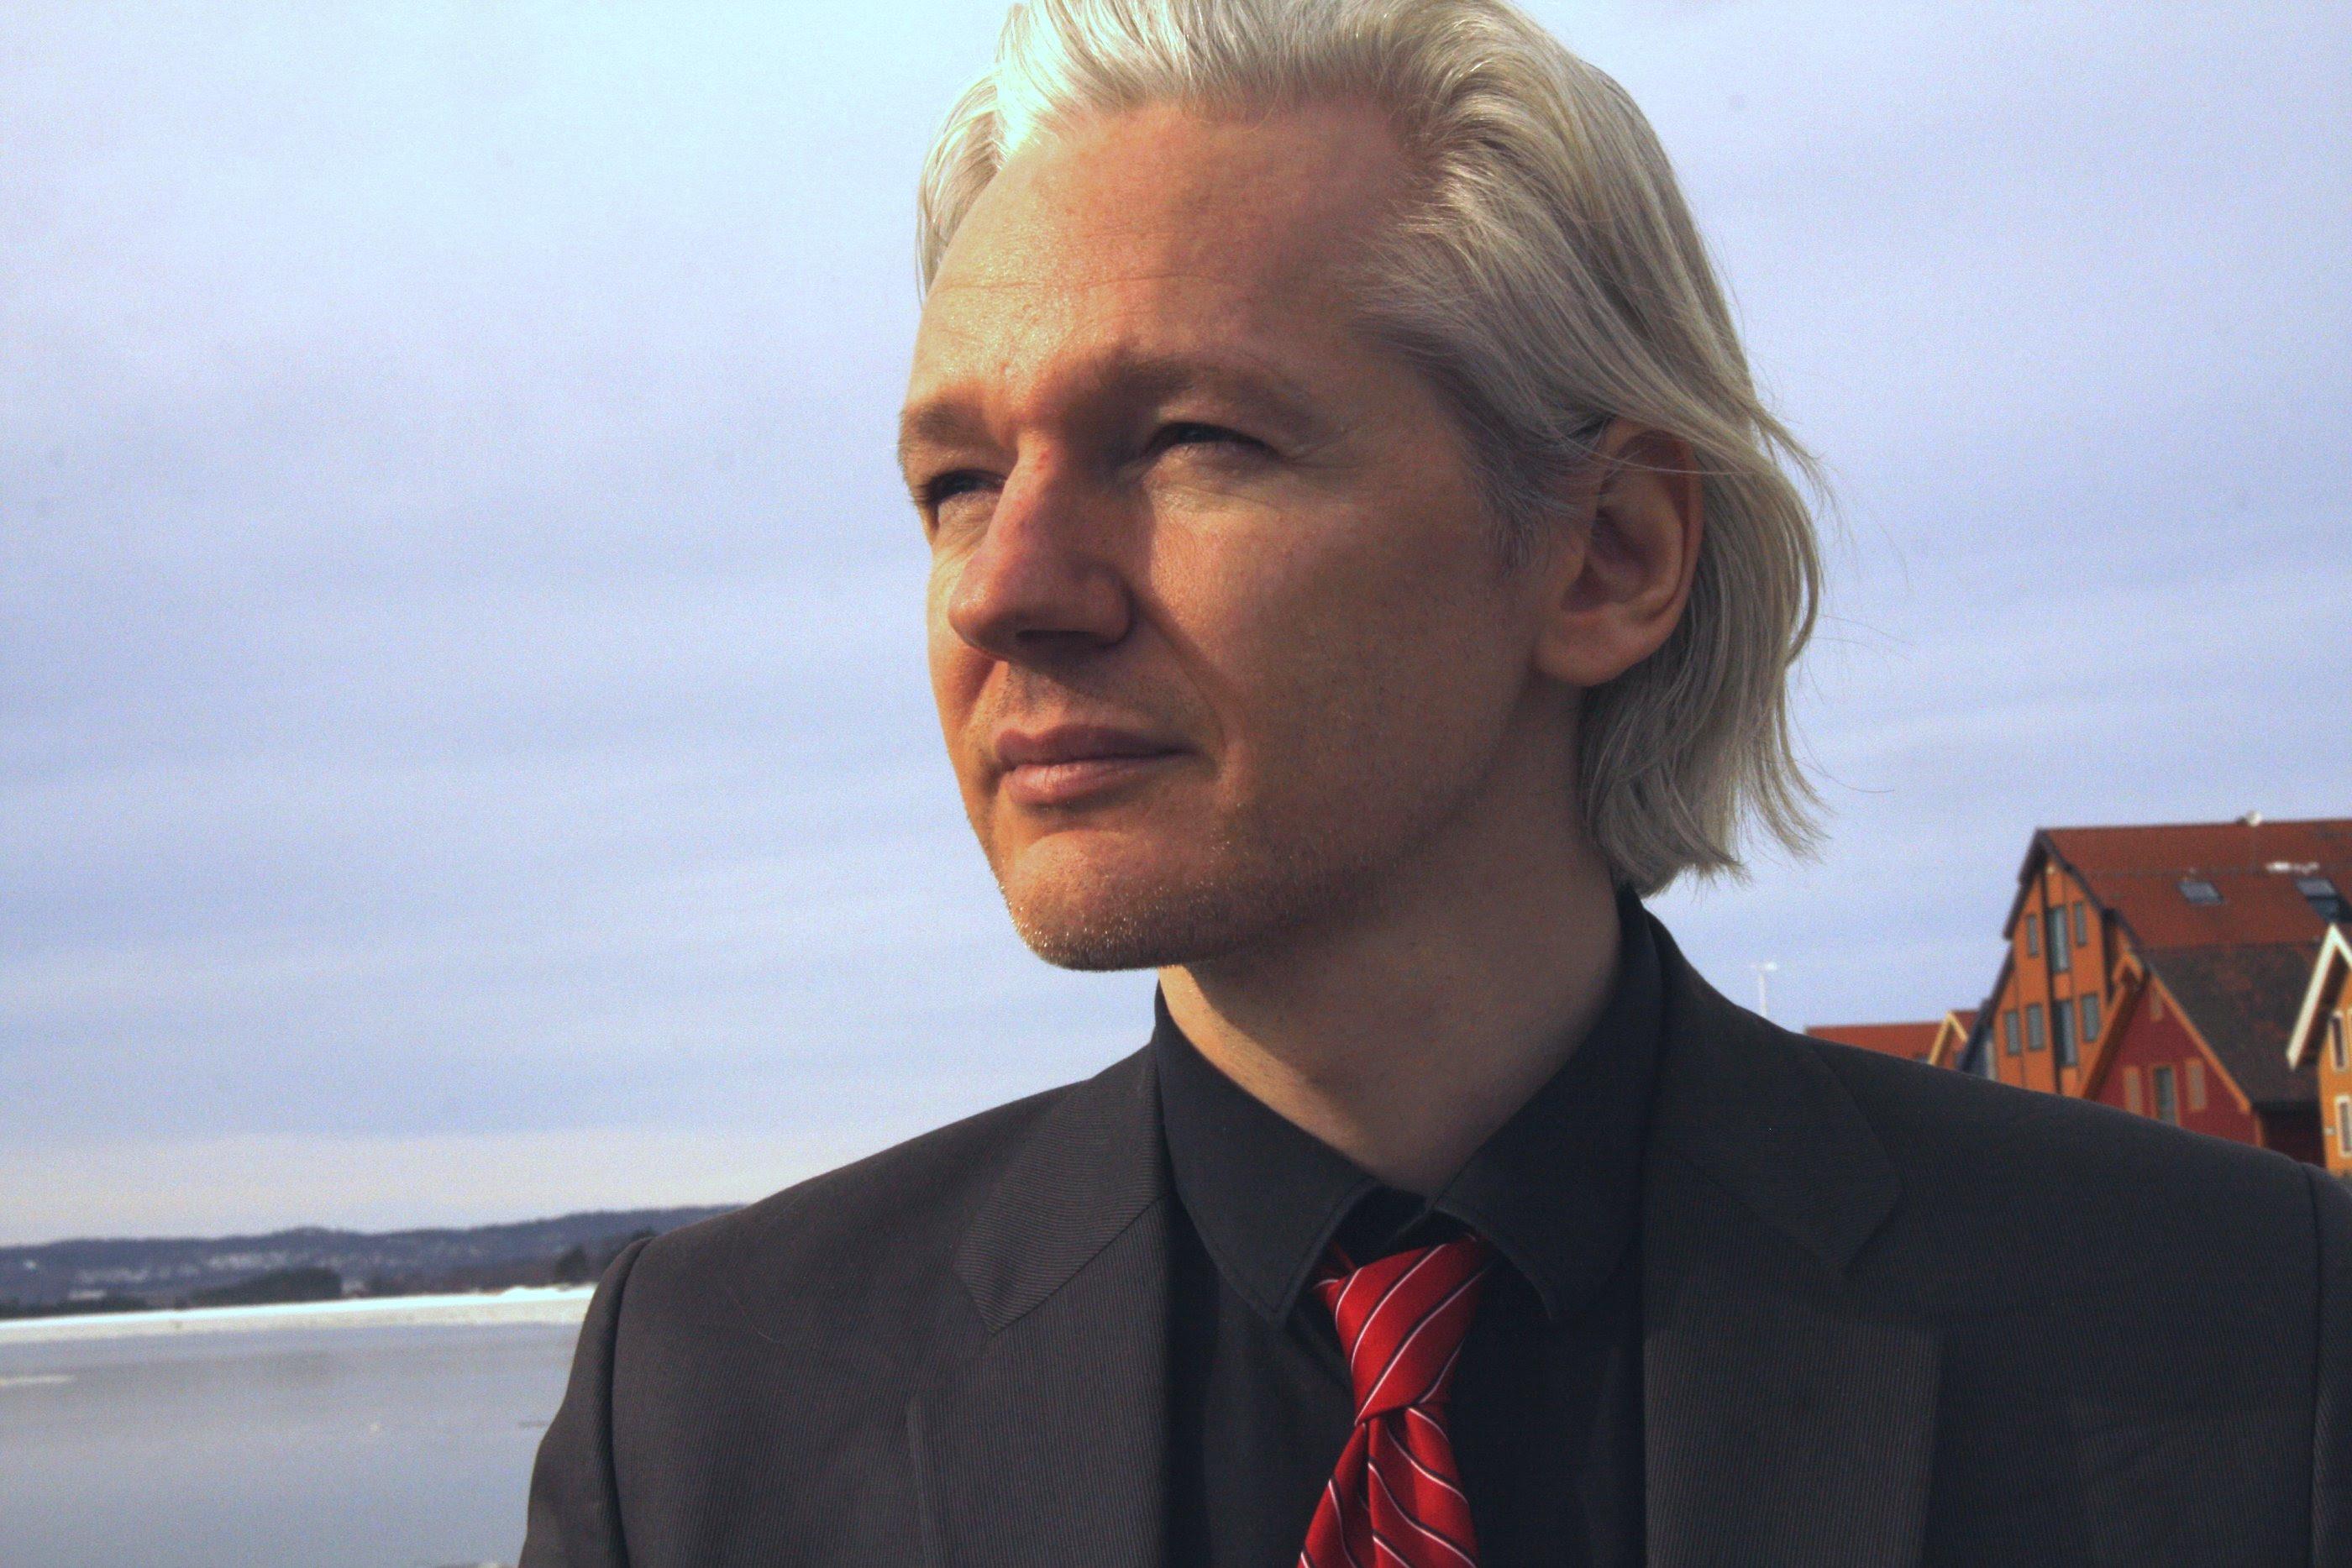 Image: Did an assassin try to kill Wikileaks founder Julian Assange?